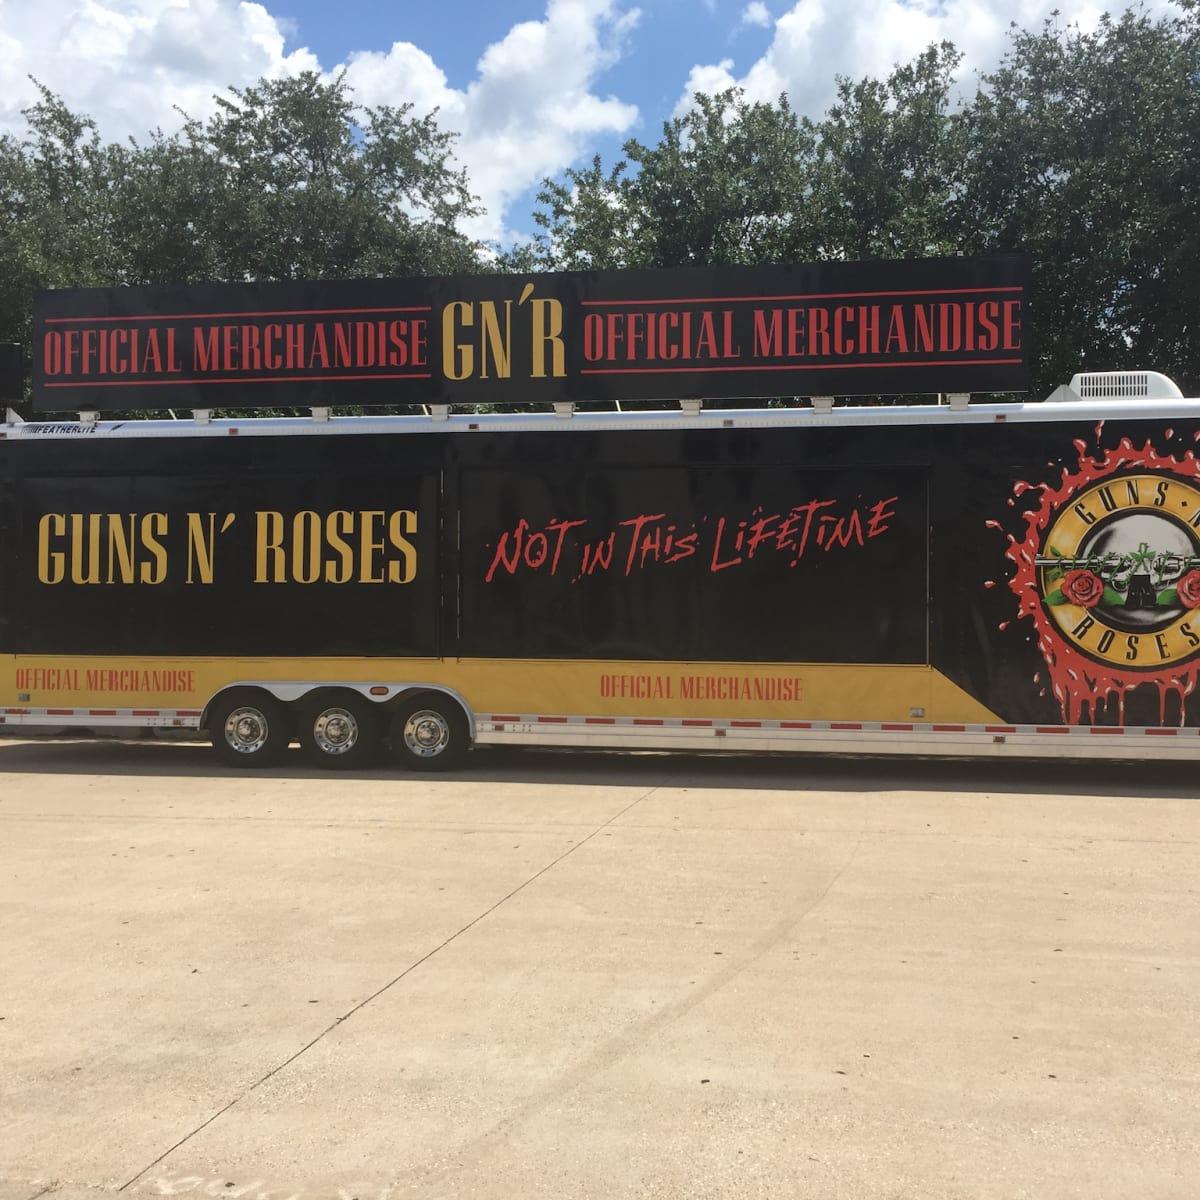 Guns N Roses Merchandise truck